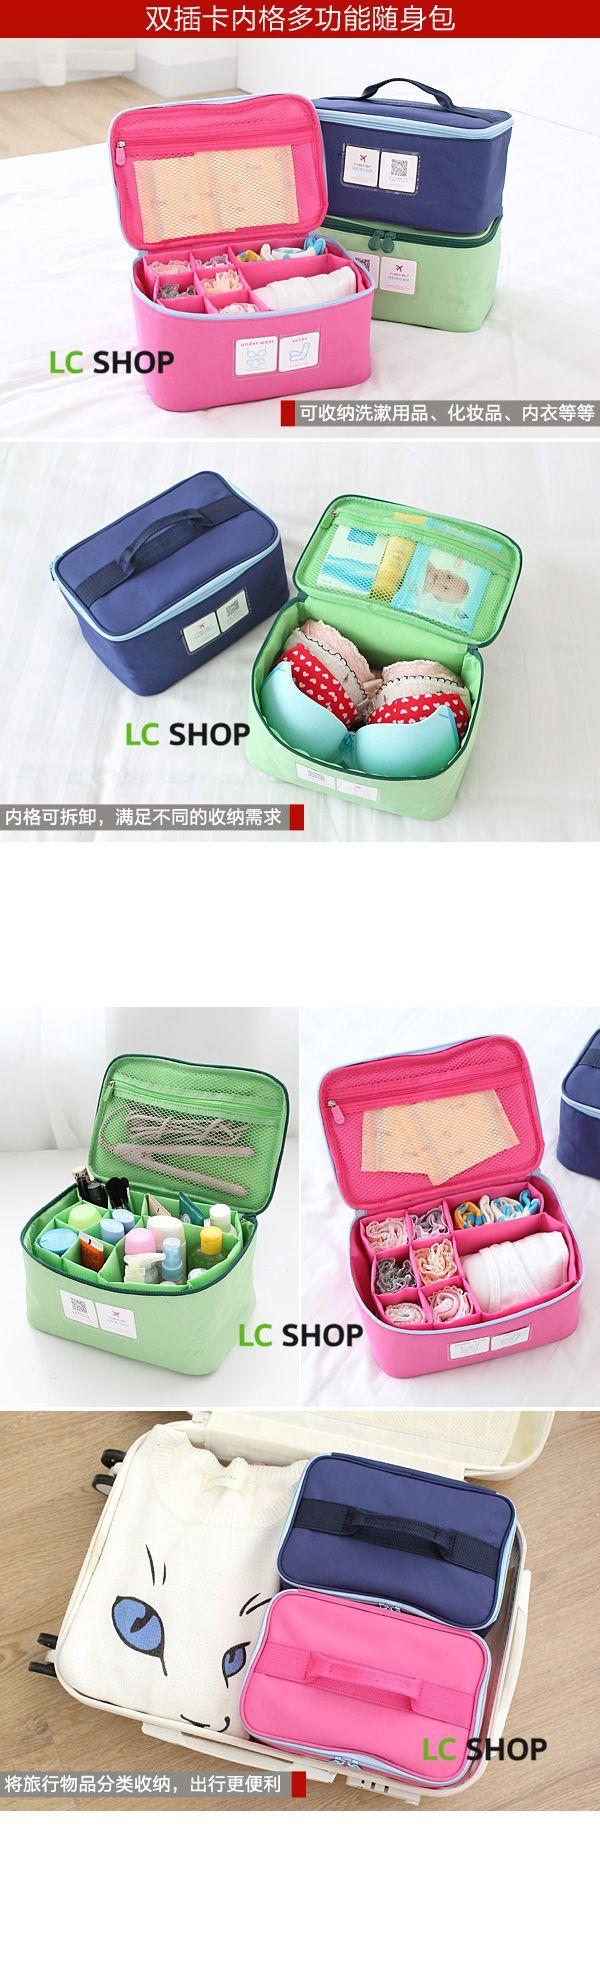 Innerwear Organizer [1800209101] - $11.90 | LazyPocket : Fashion and Lifestyle Cloud ( Soul, Tokyo, Taipei, Hong Kong, Shanghai ) - Shipping Globally.